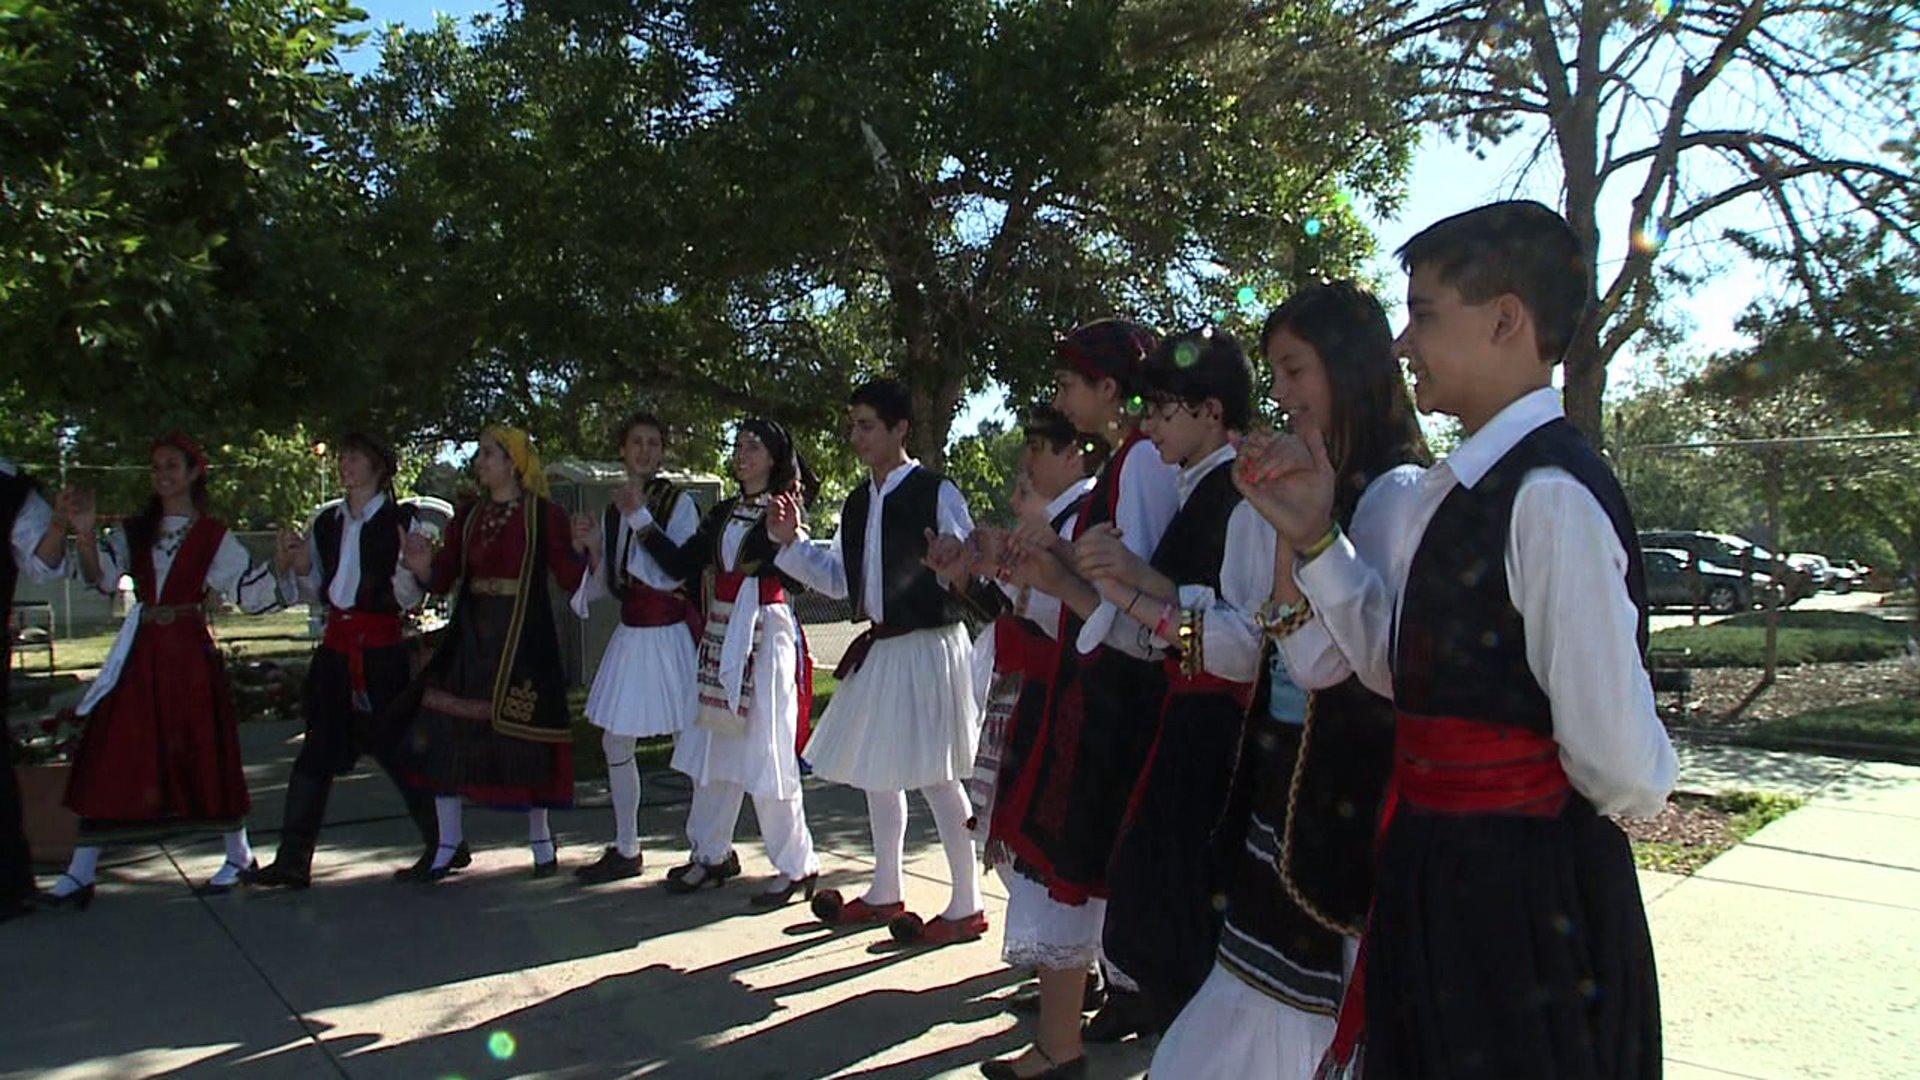 Greek Festival in Denver